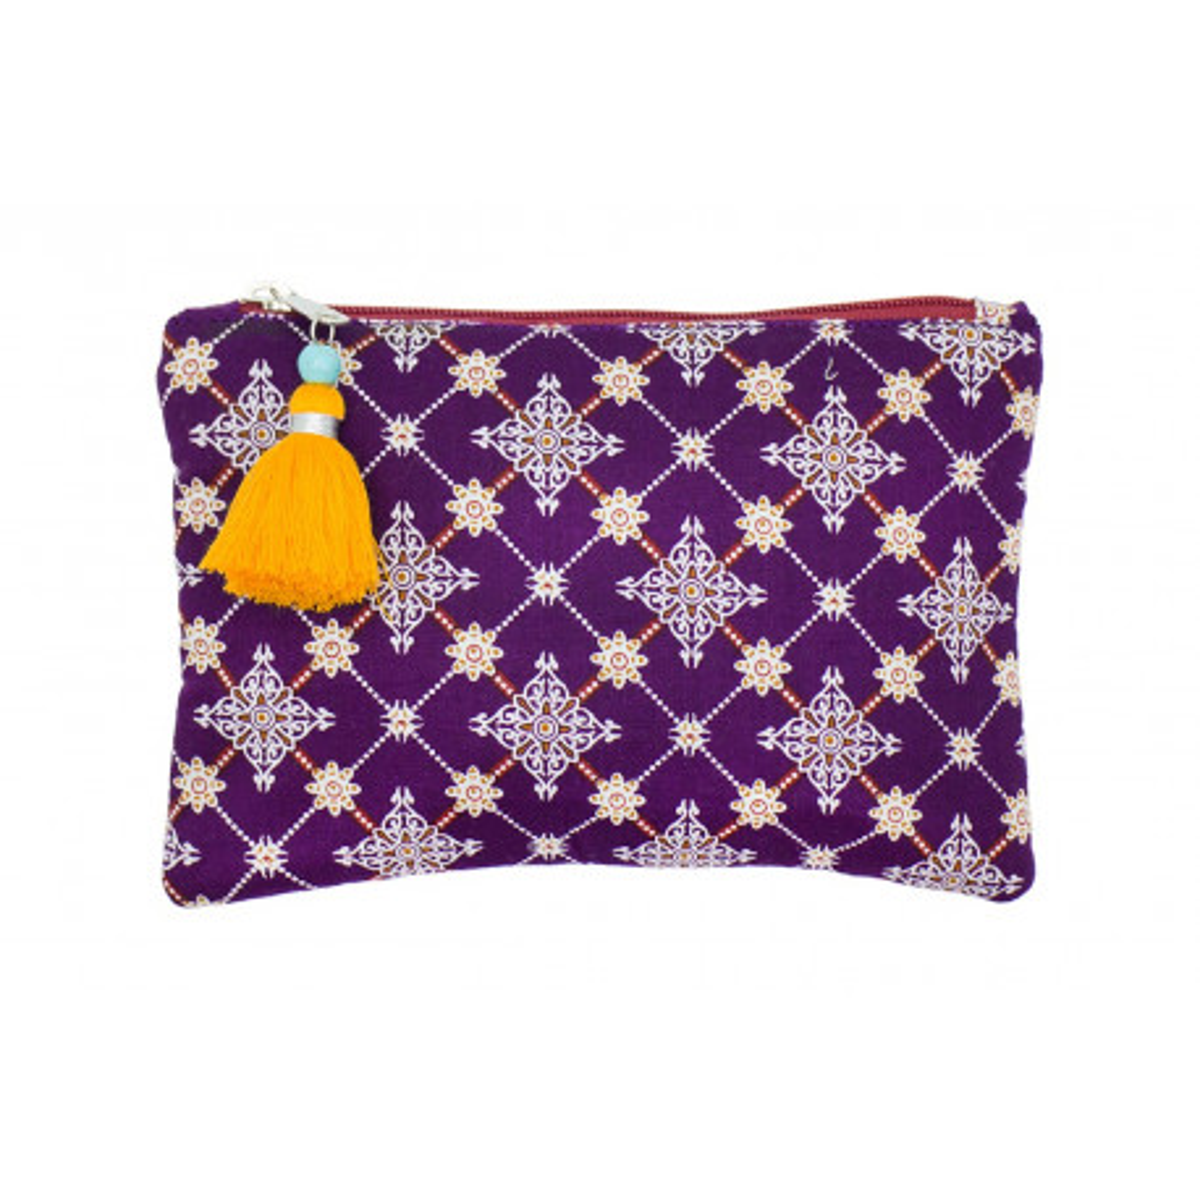 Petite pochette plate coton violet prune